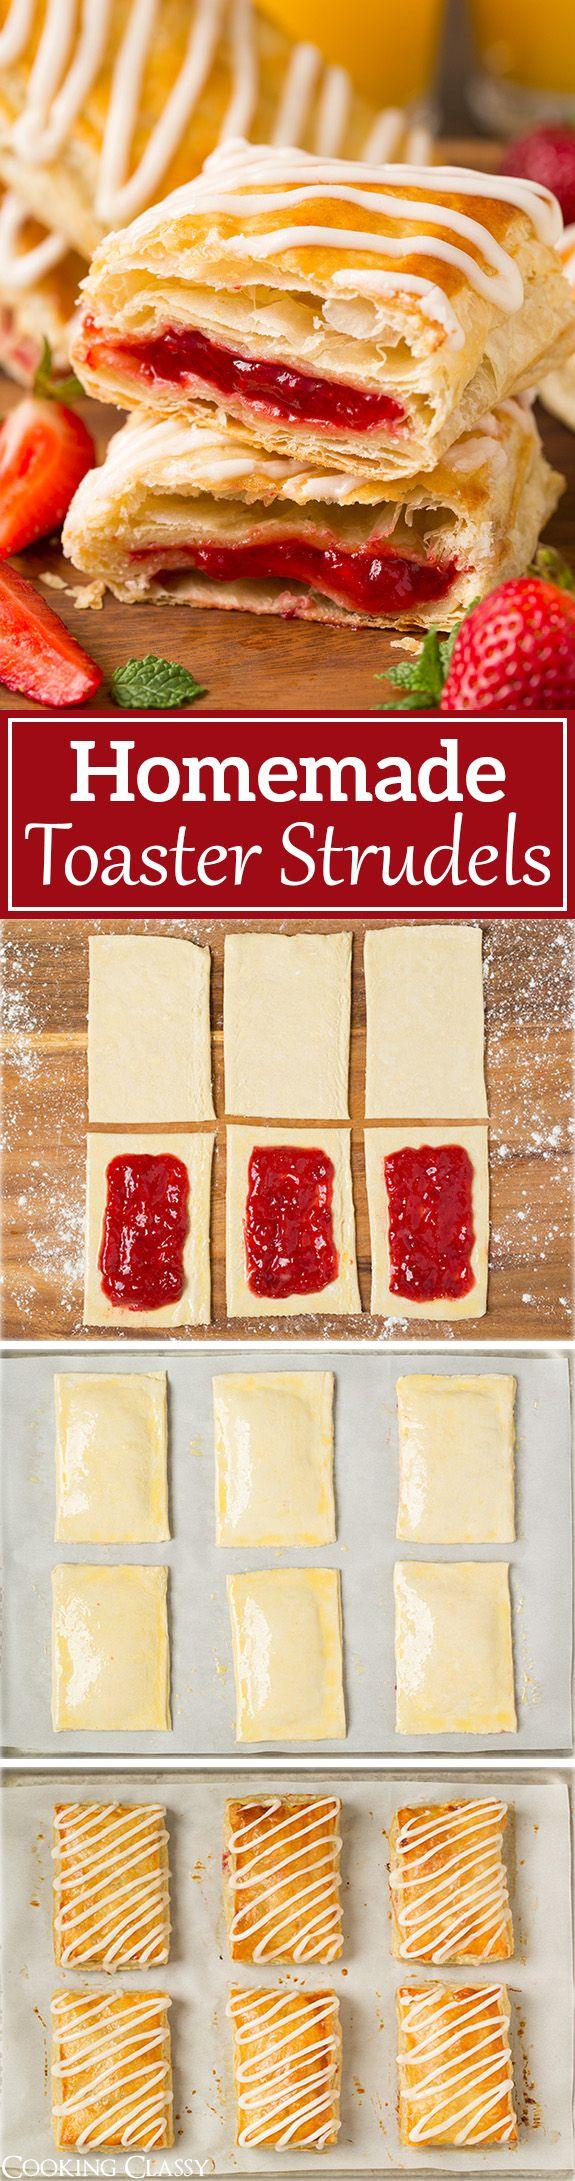 homemade toaster strudels pinterest